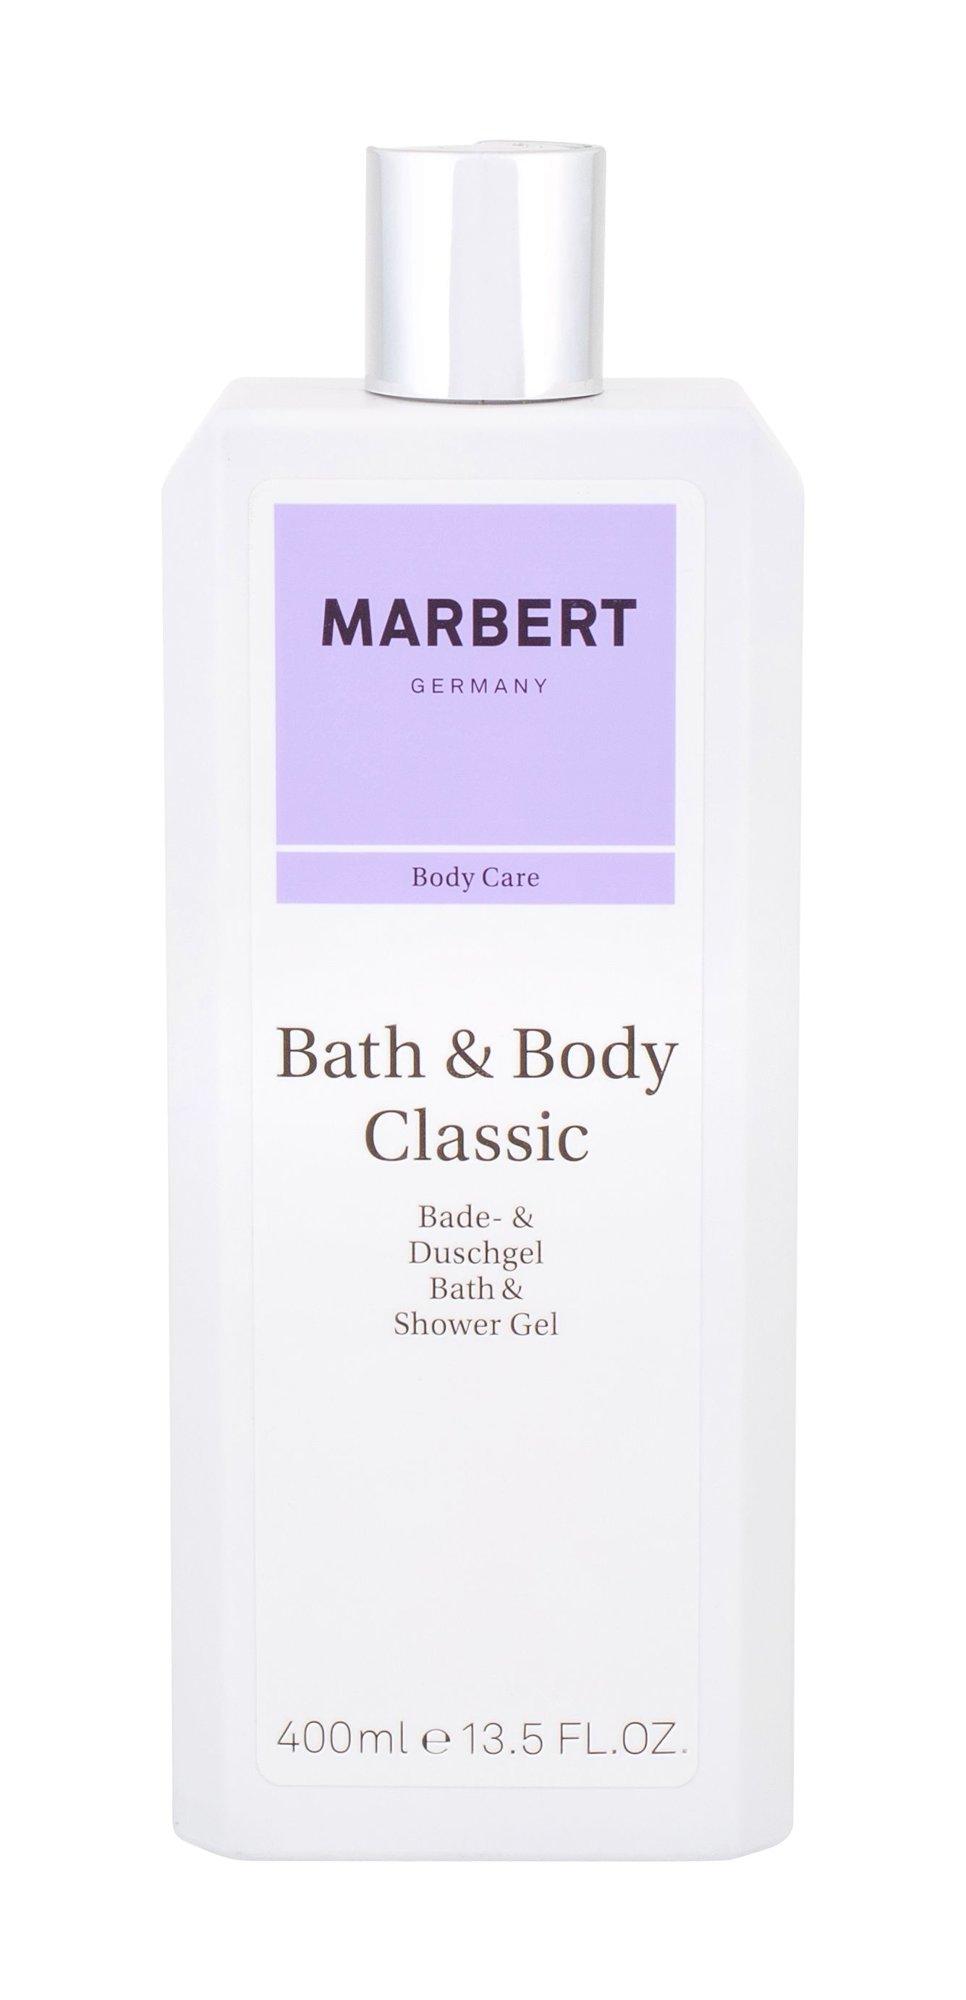 Marbert Bath & Body Classic Shower Gel 400ml